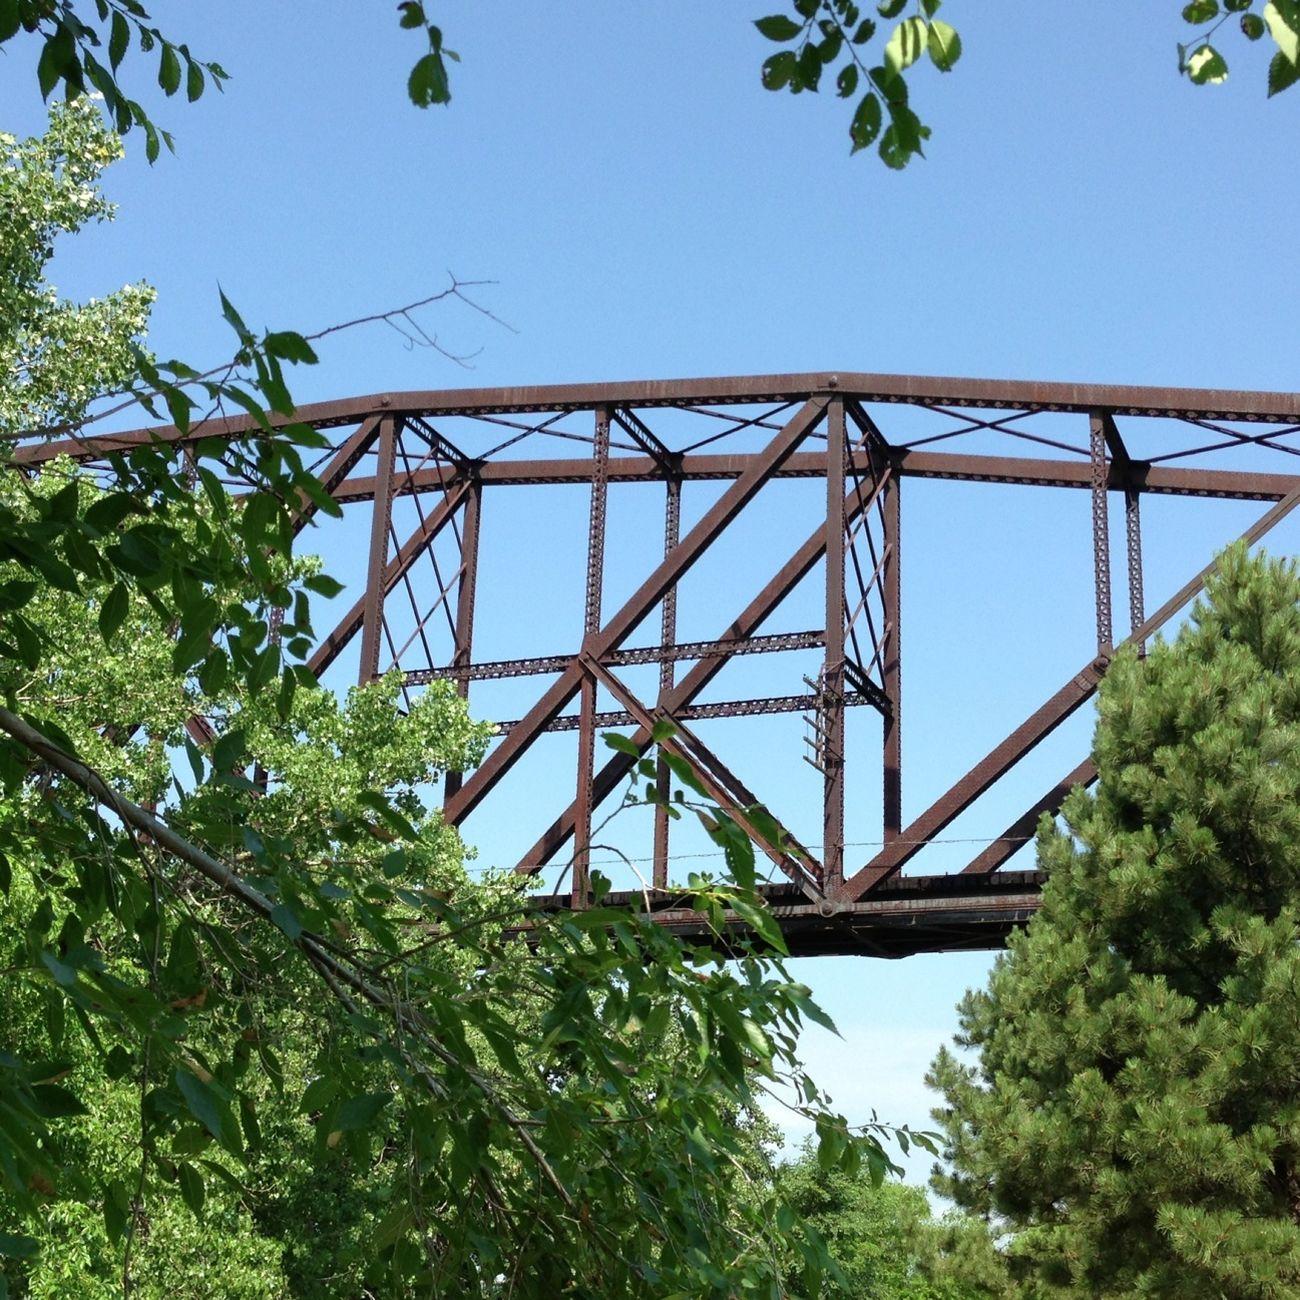 Bridge peeking through the trees along the Missouri River. Architecture Bridges North Dakota Railroad